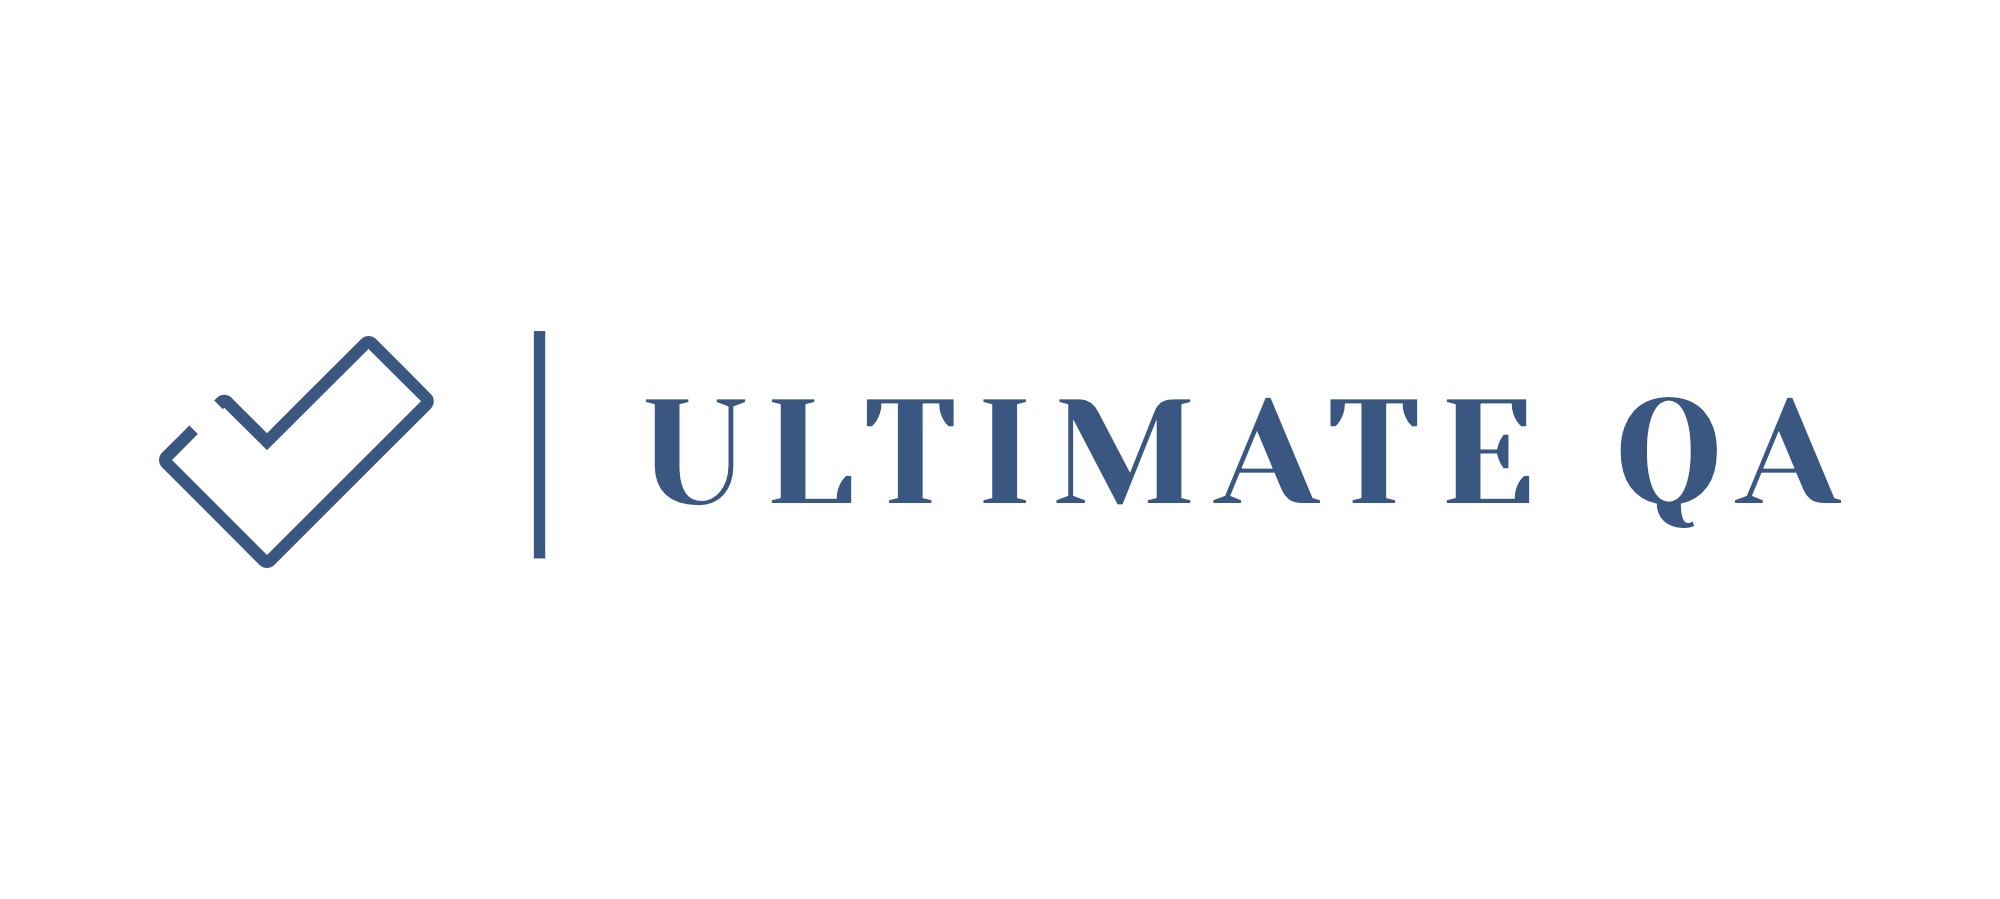 Ultimate QA